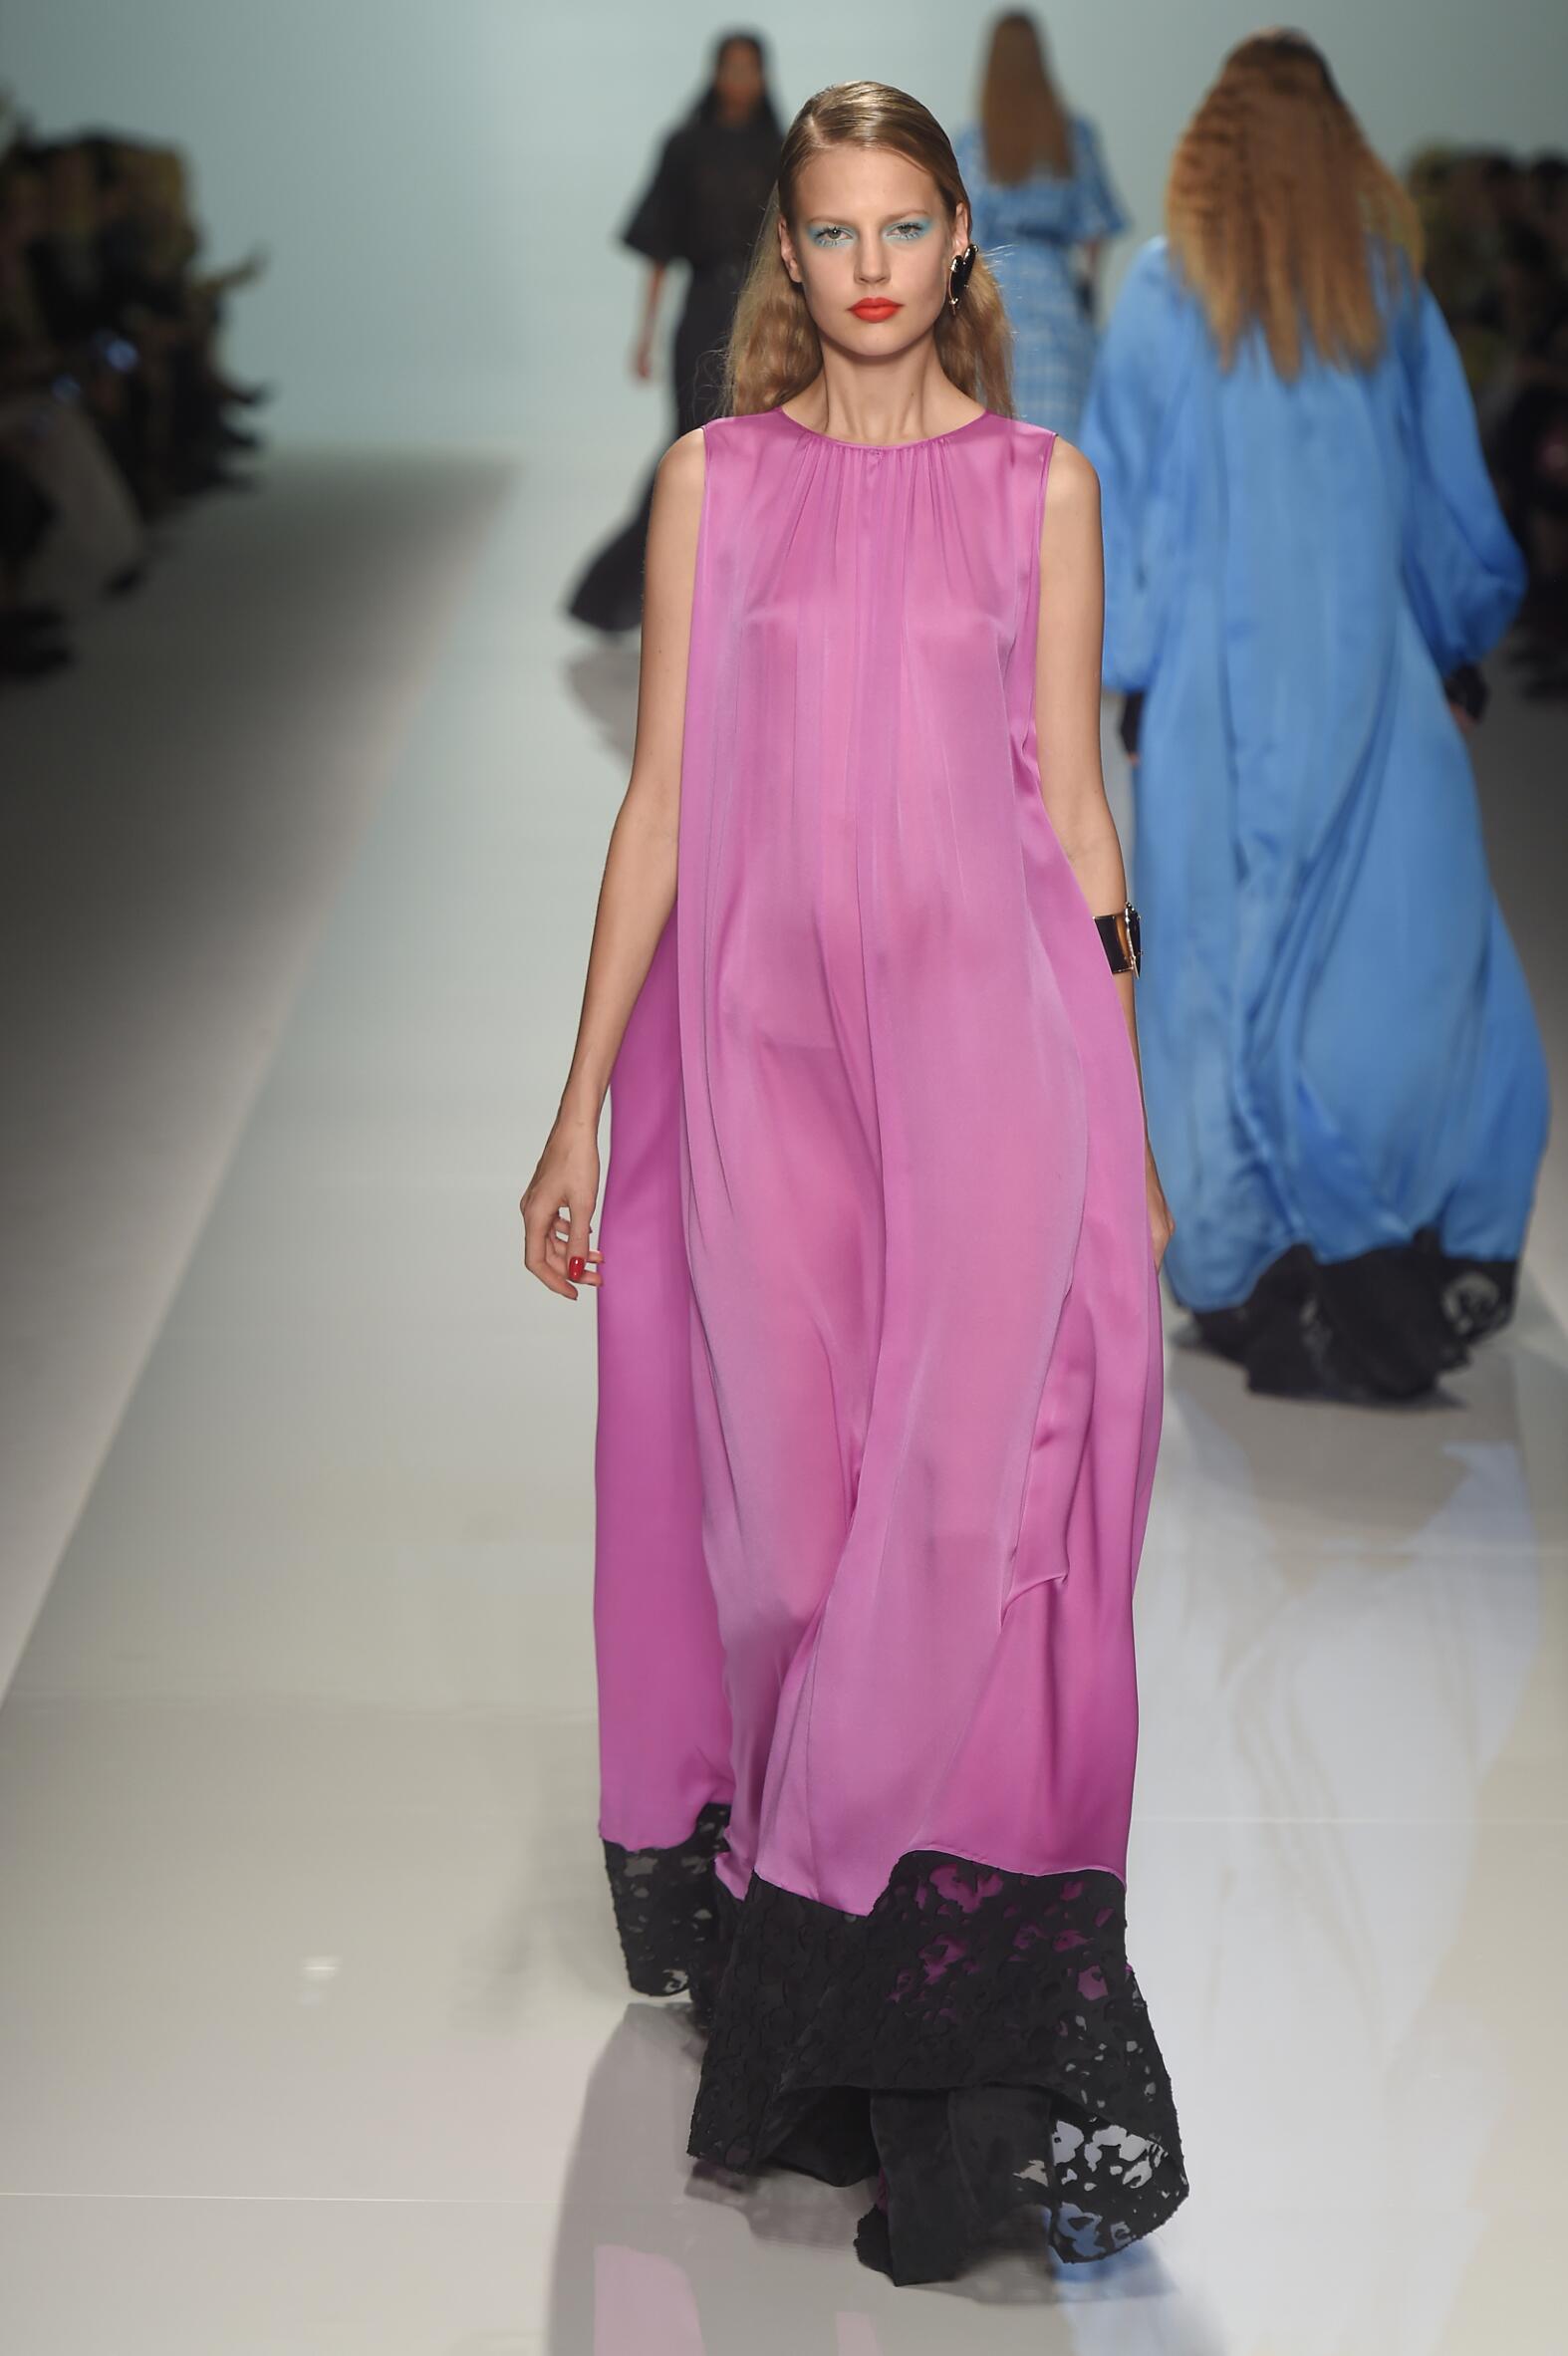 Fashion Woman Model Emanuel Ungaro Catwalk